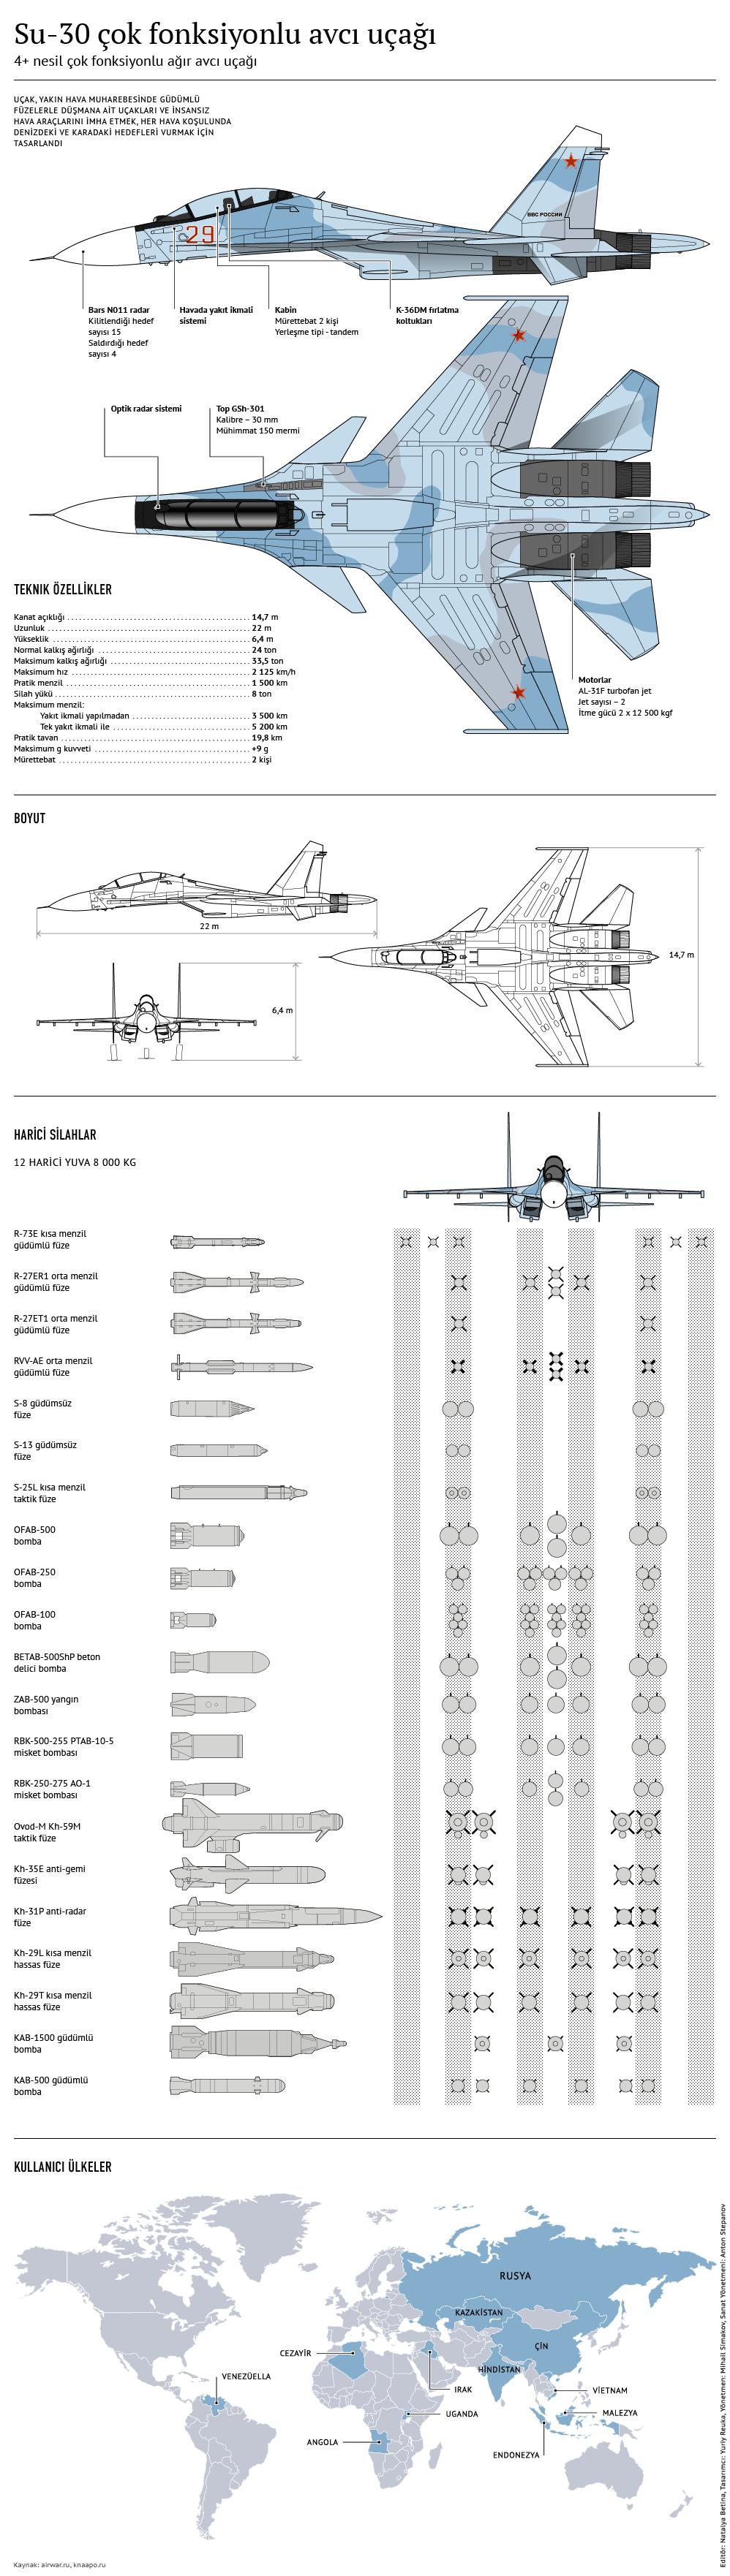 Su-30 çok fonksiyonlu avcı uçağı